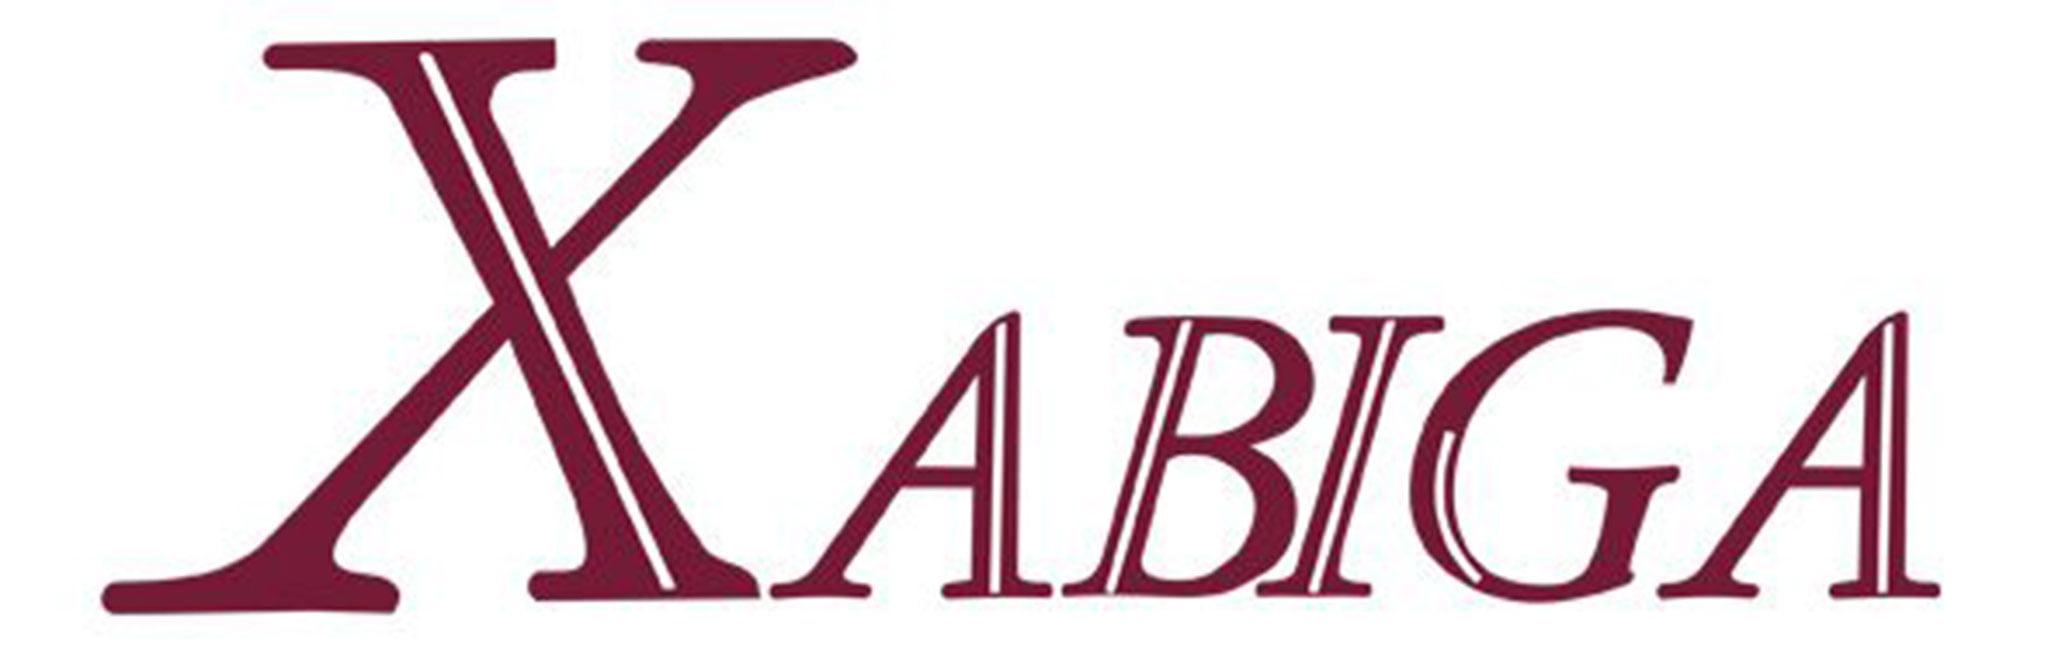 Logotipo de Xabiga Inmobiliaria